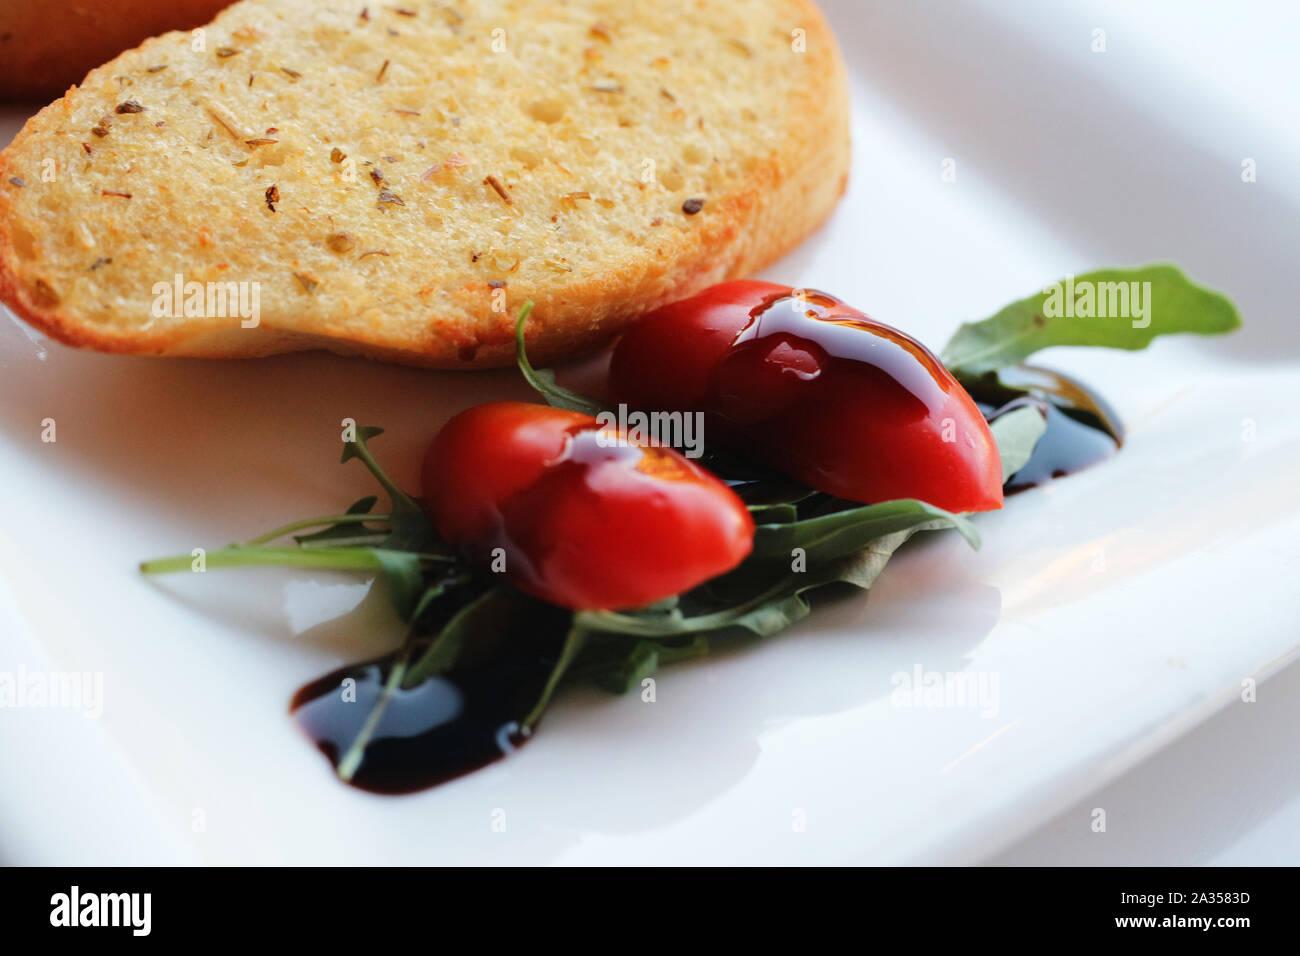 Garnish of cherry tomato with balsamic vinegar and garlic bread Stock Photo